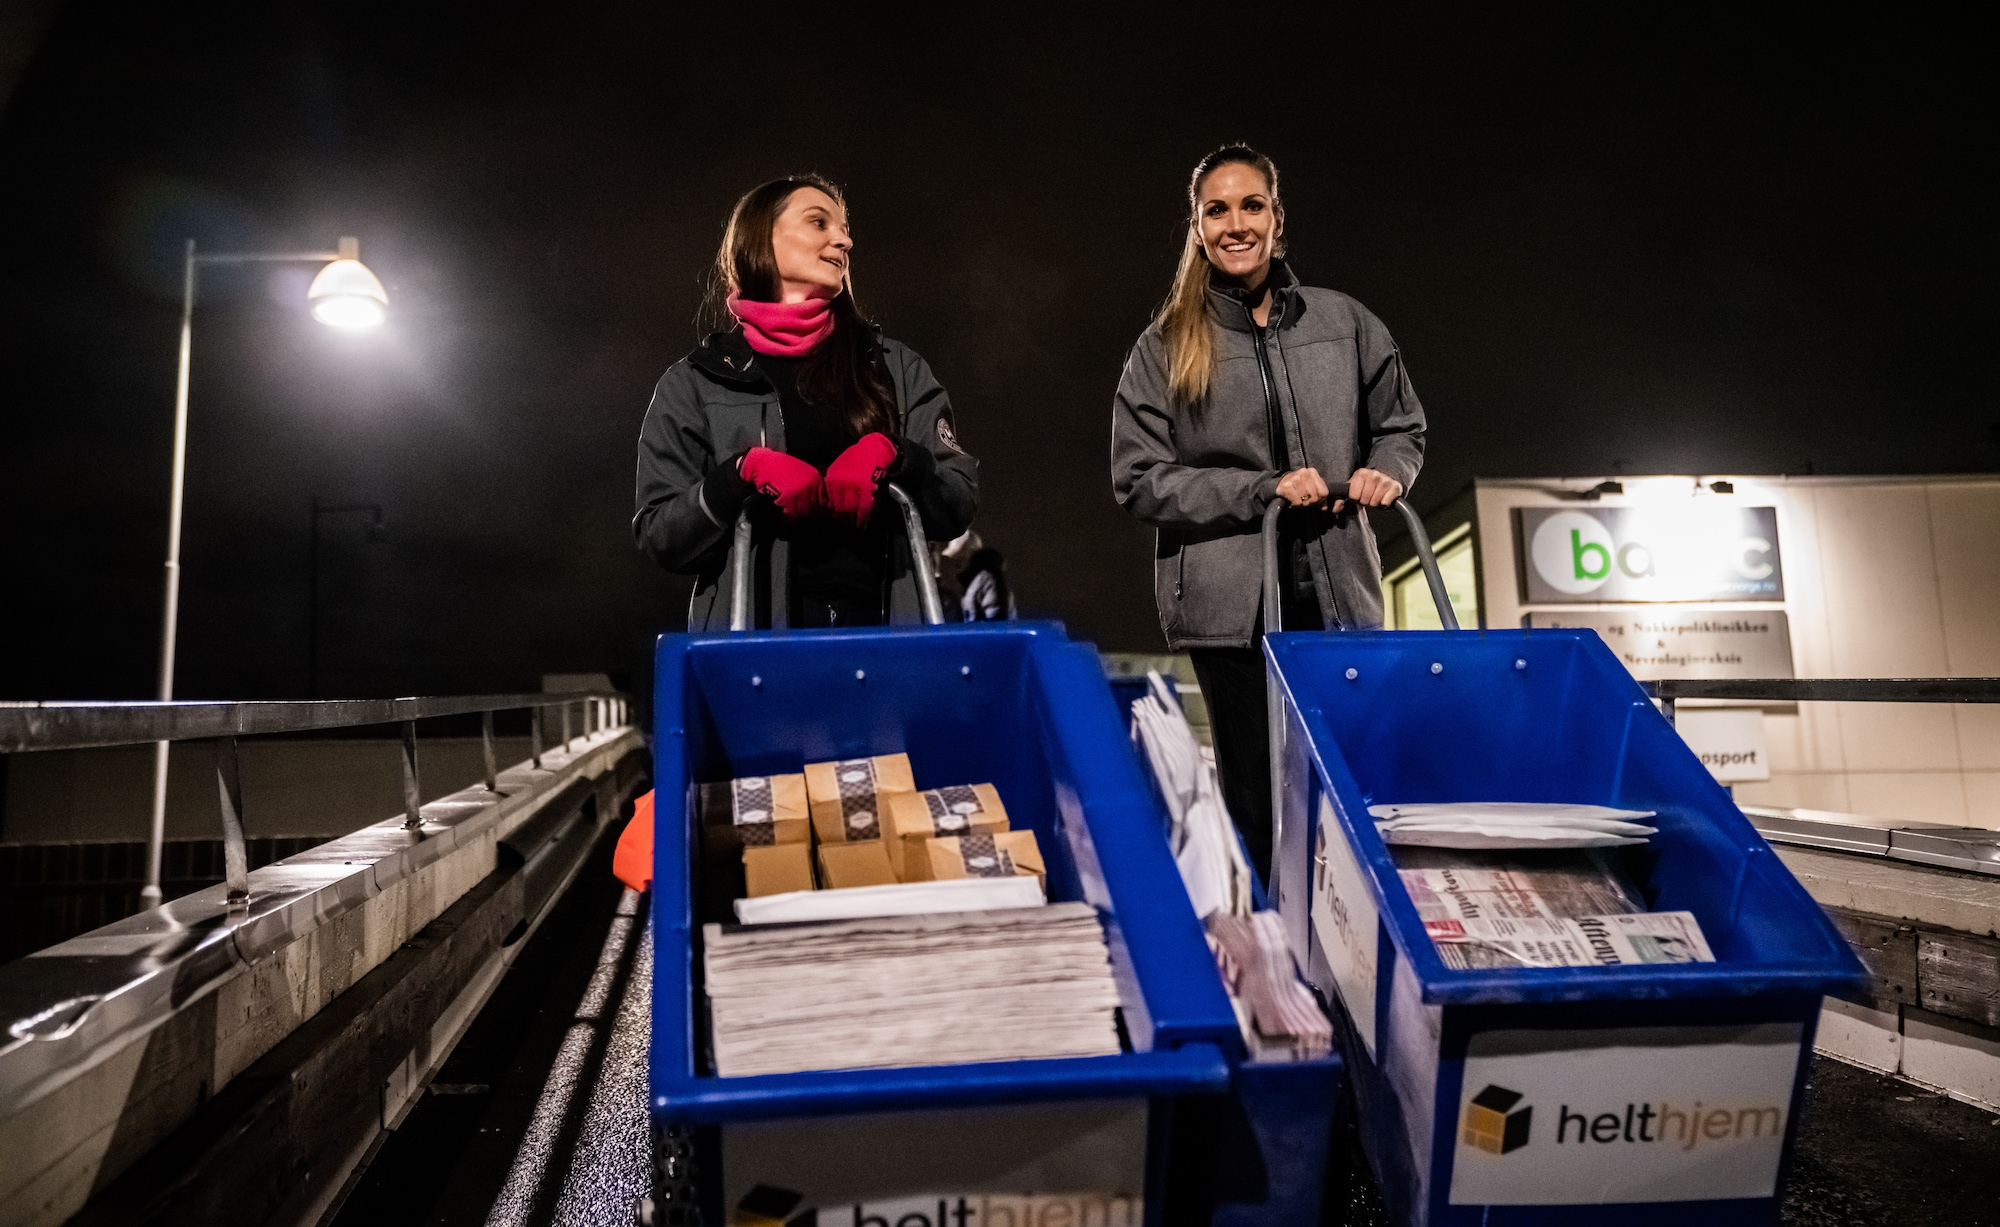 Treningsfrue-Camilla-Aastorp-Andersen-prøver-seg-som-helthjem-avisbud